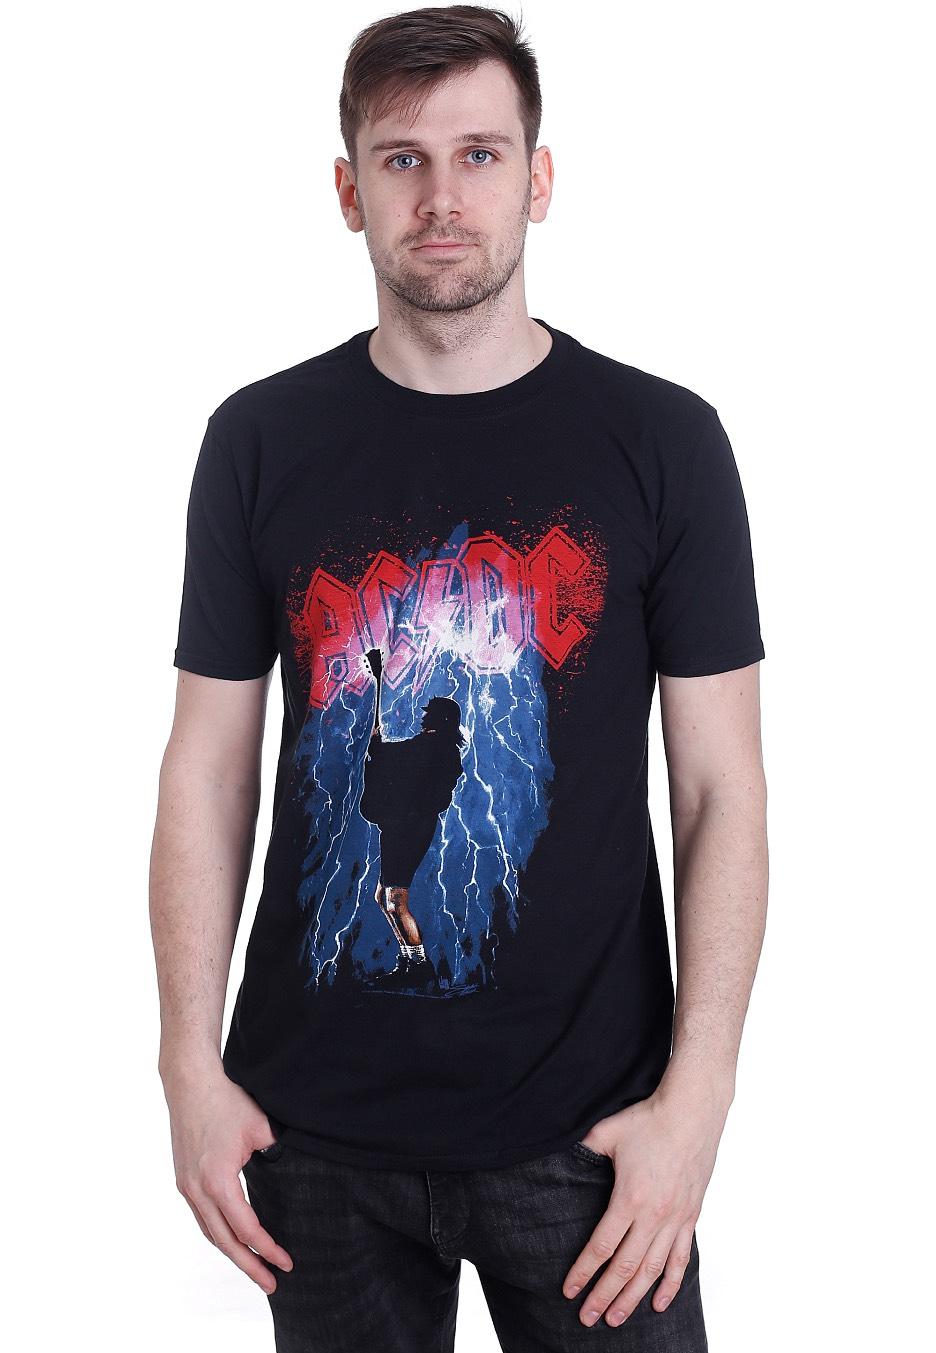 cd42ff0528 AC DC - Thunderstruck - T-Shirt - Official Hard Rock Merchandise Shop -  Impericon.com Worldwide